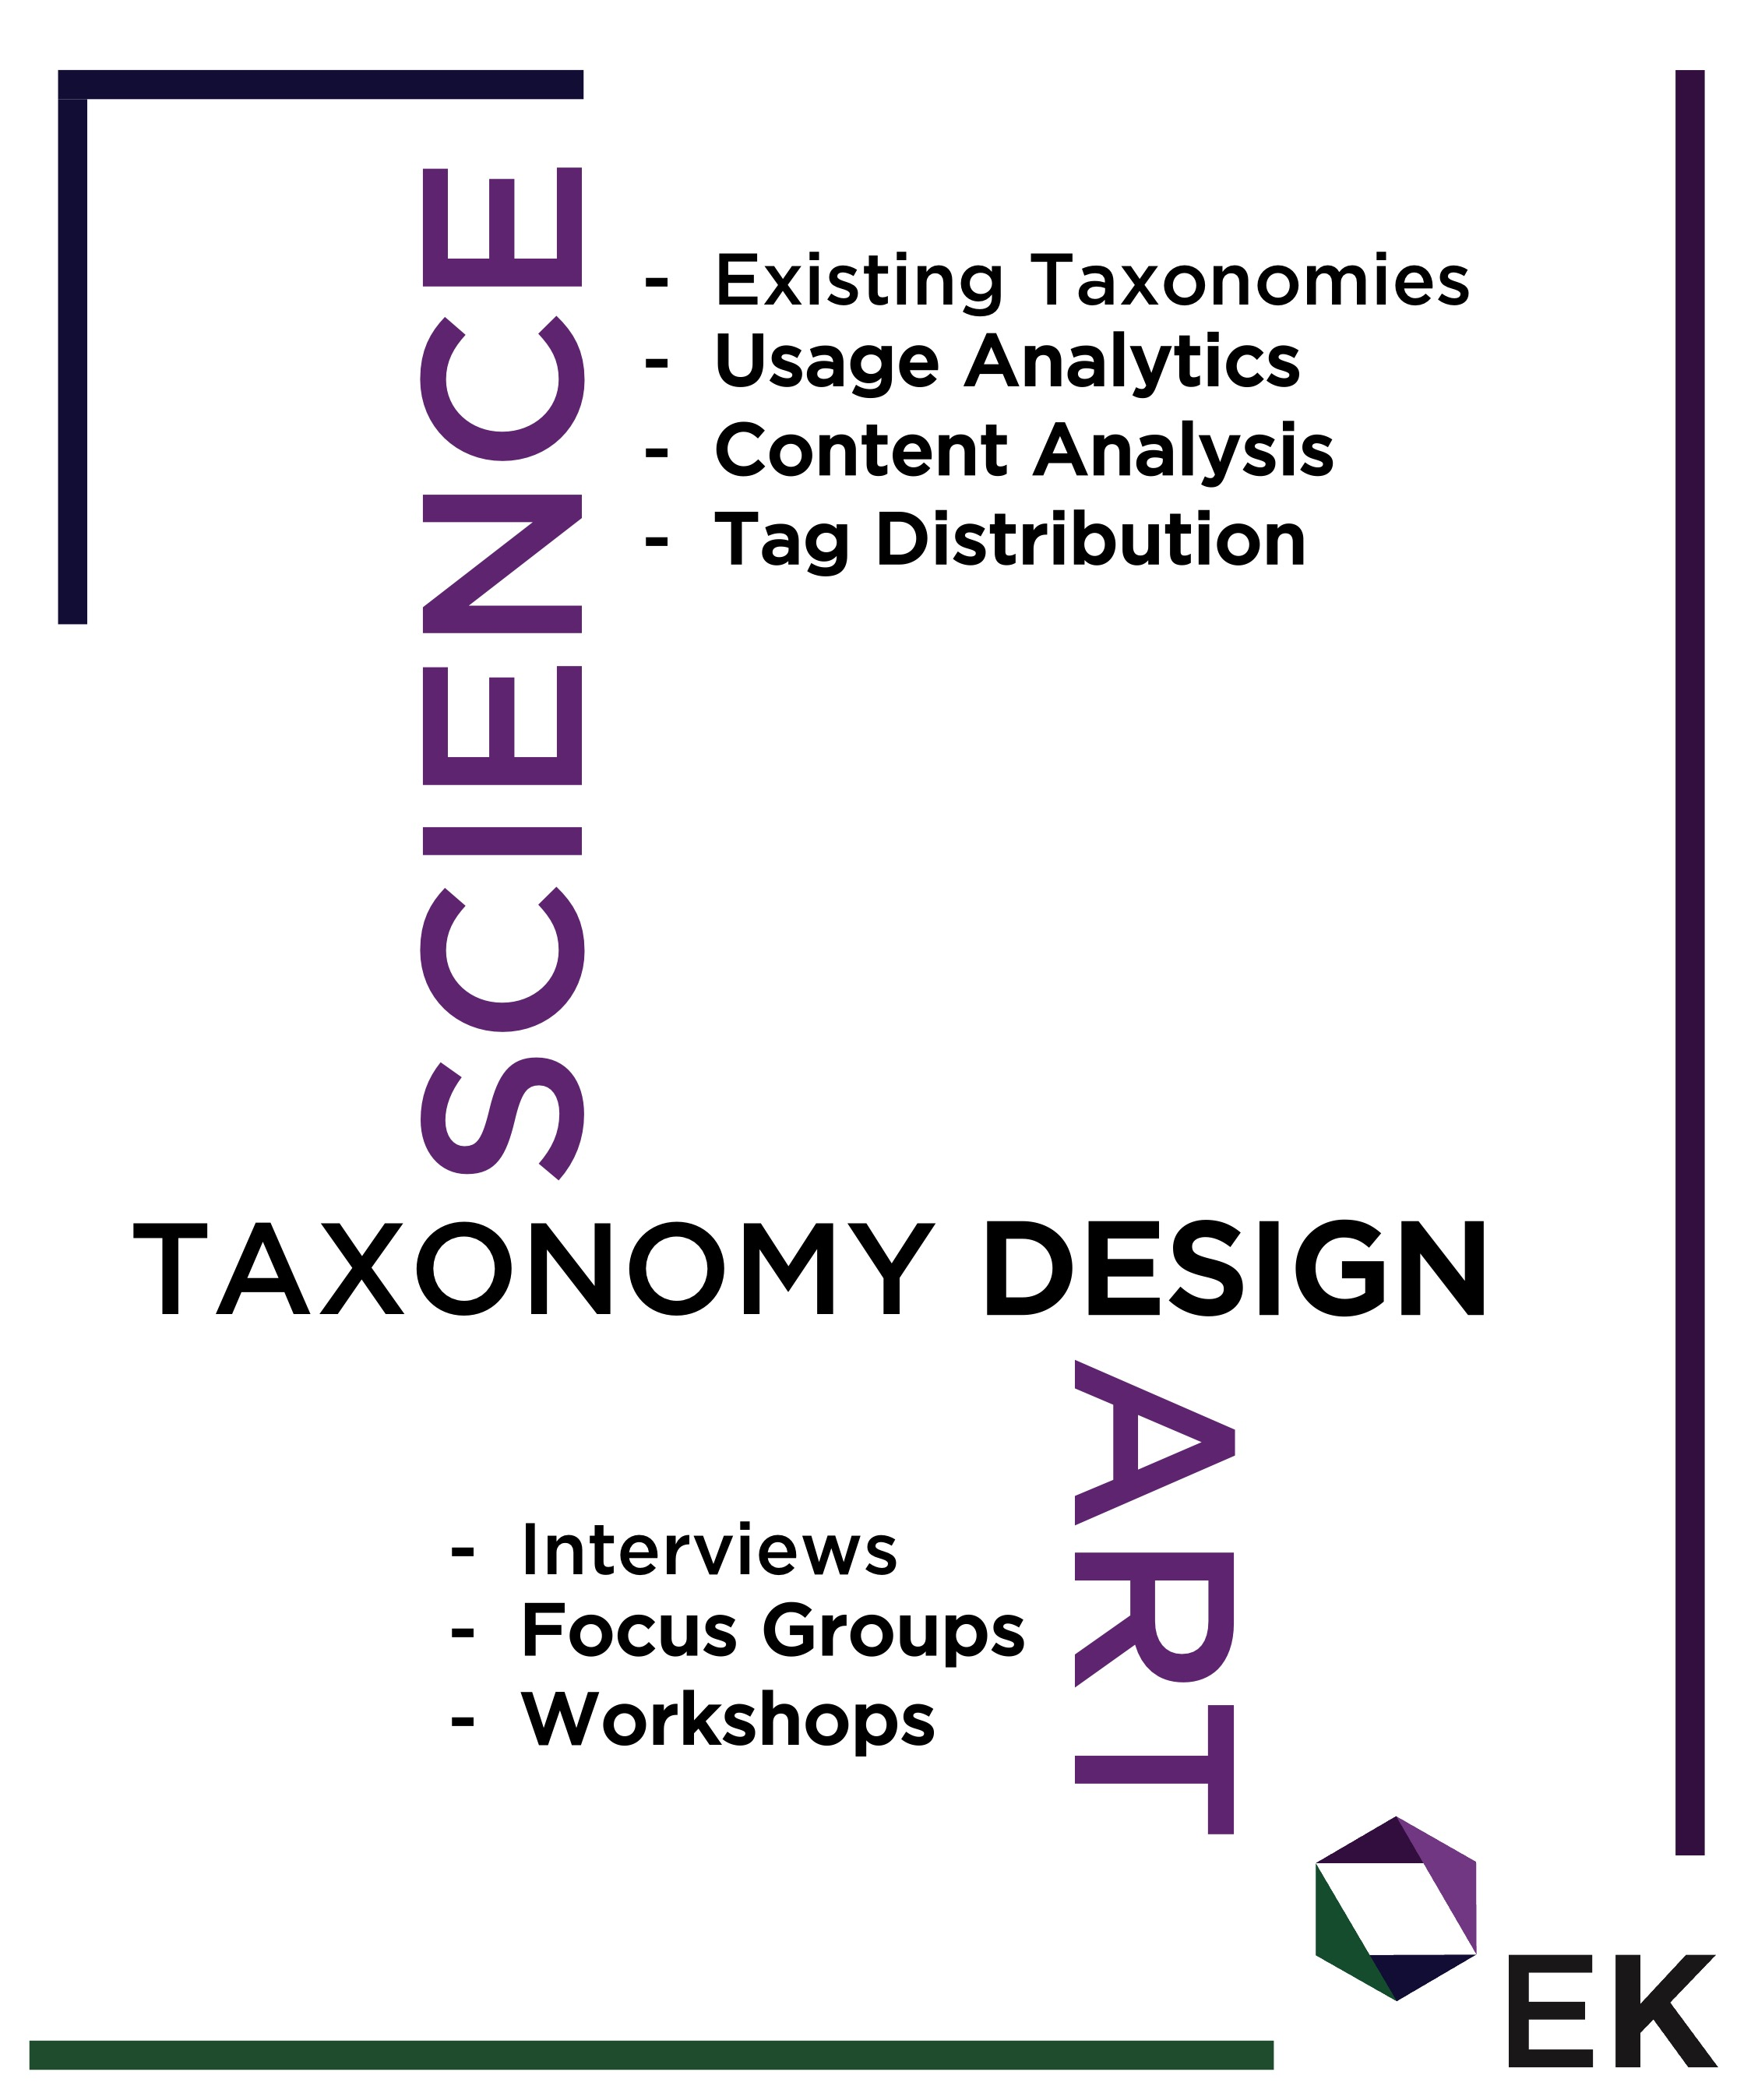 Art of Enterprise Knowledge Taxonomy Design